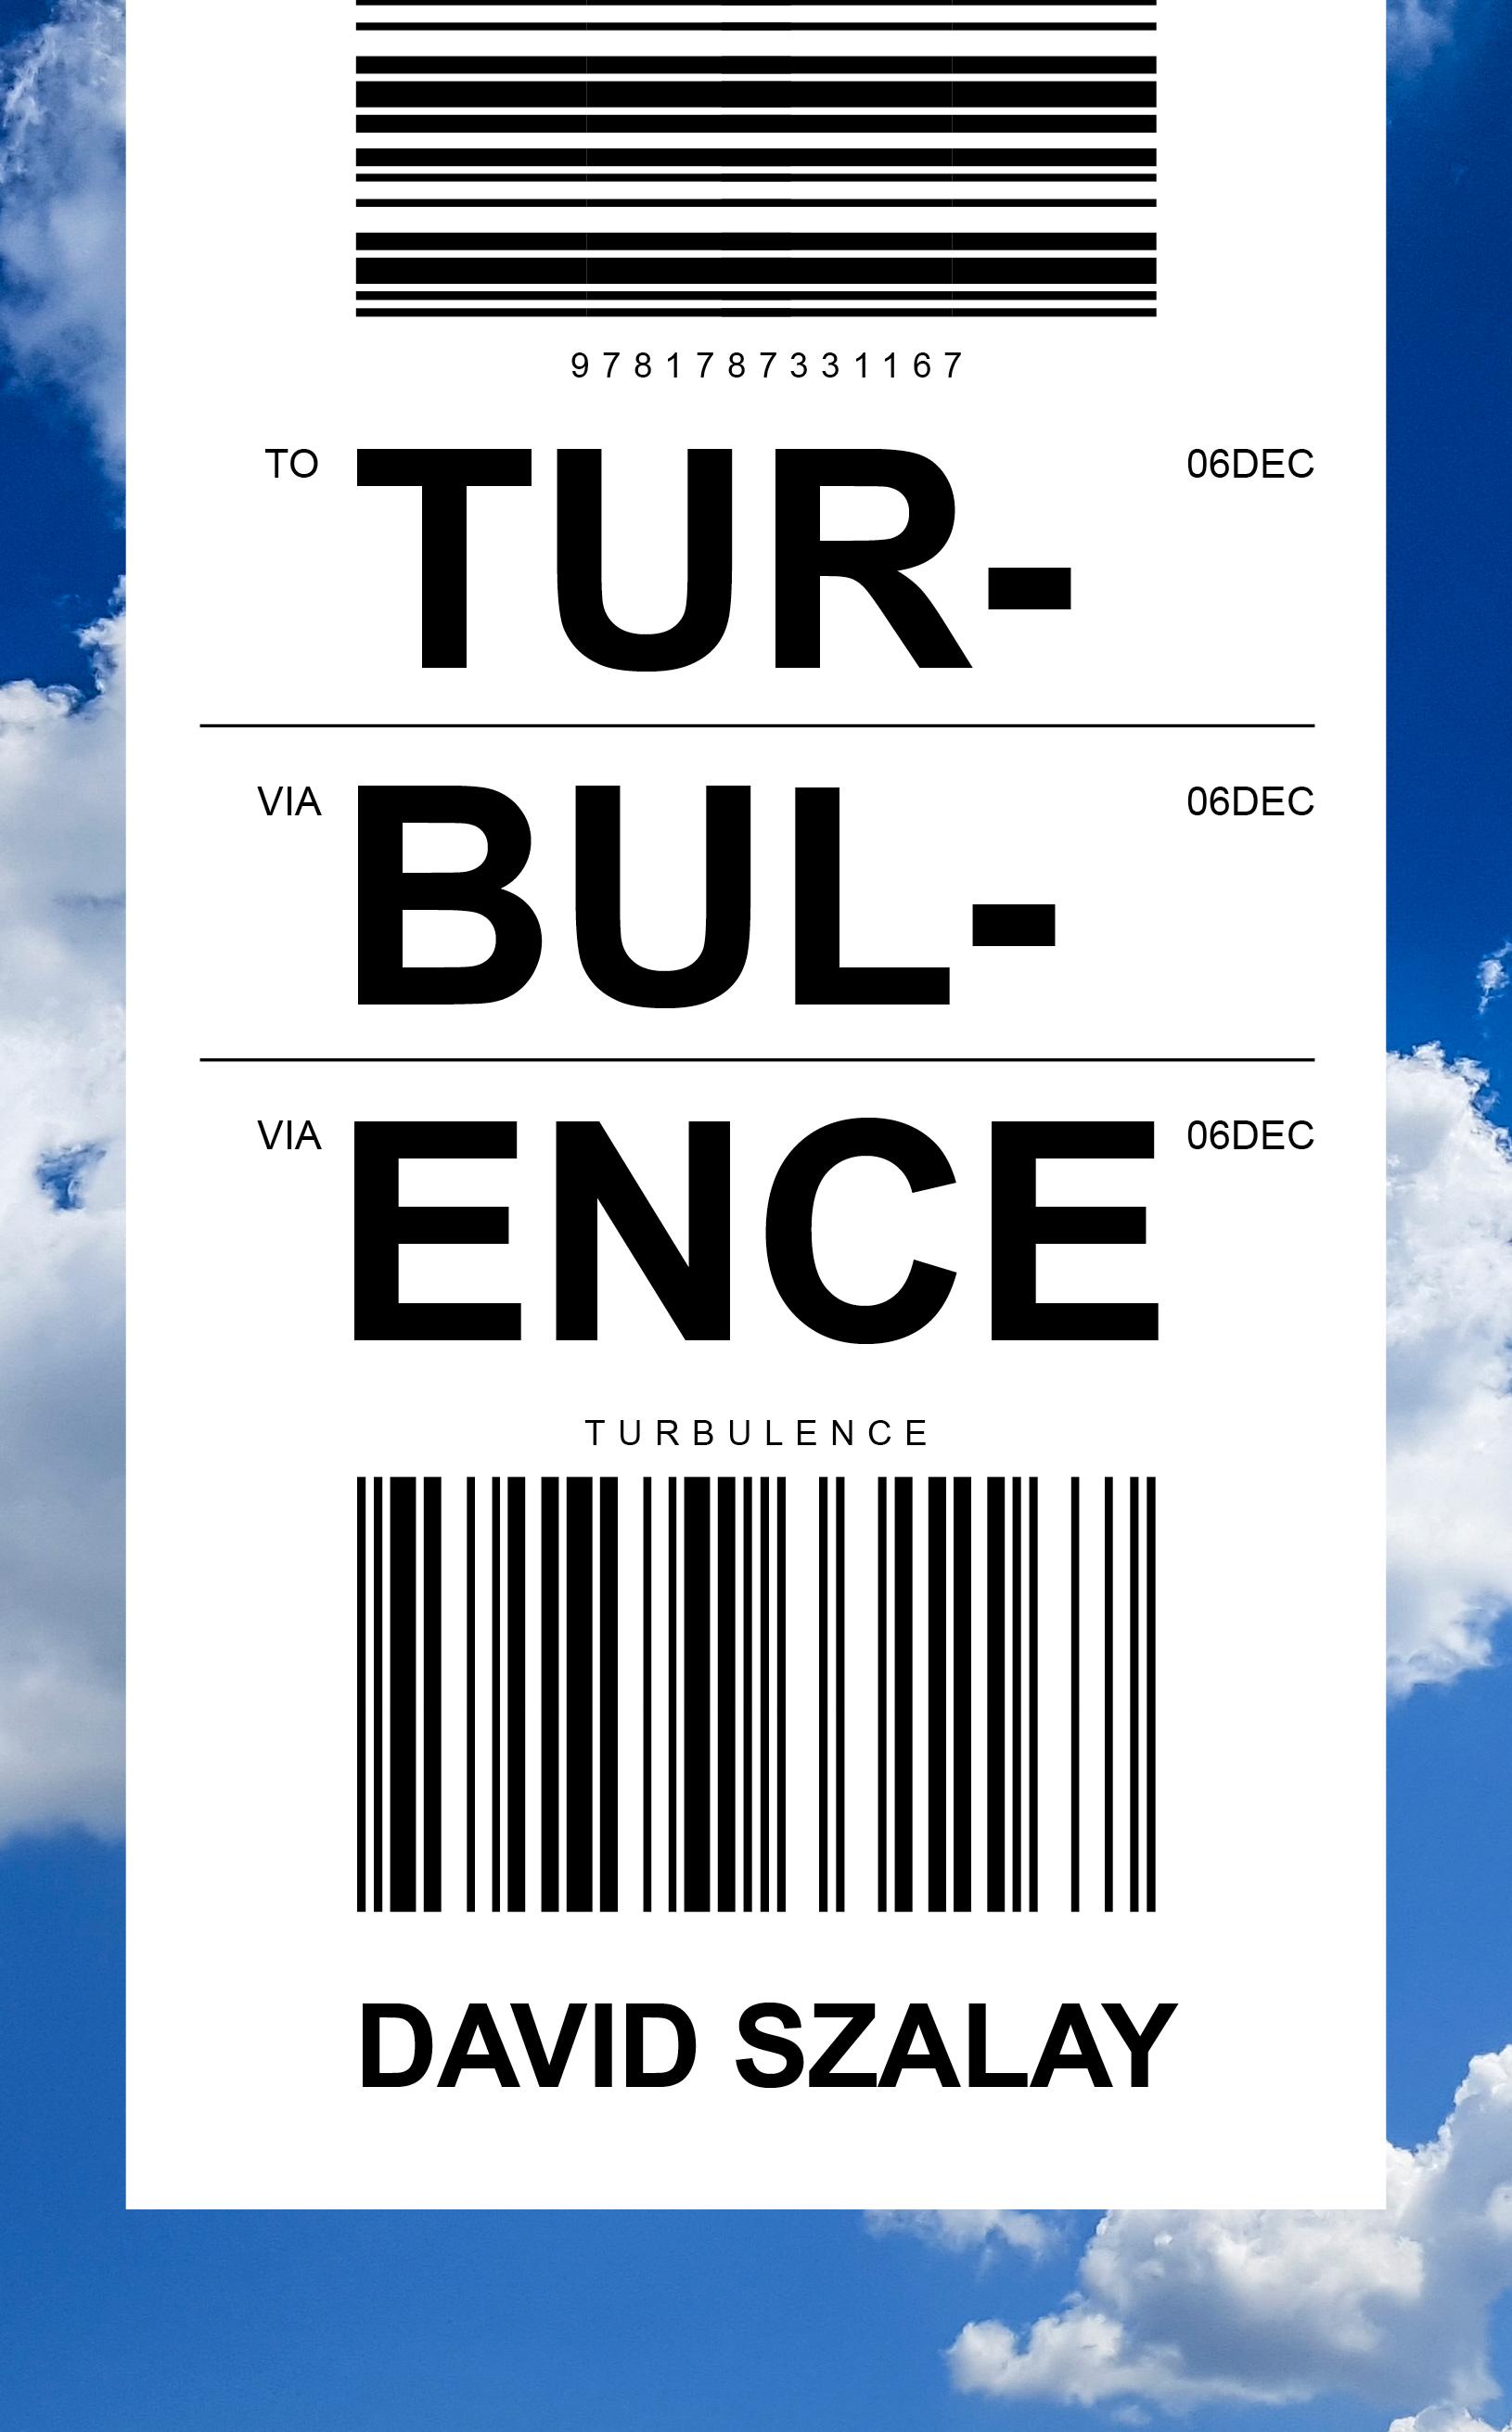 Turbulence Jpeg 3[2].jpg